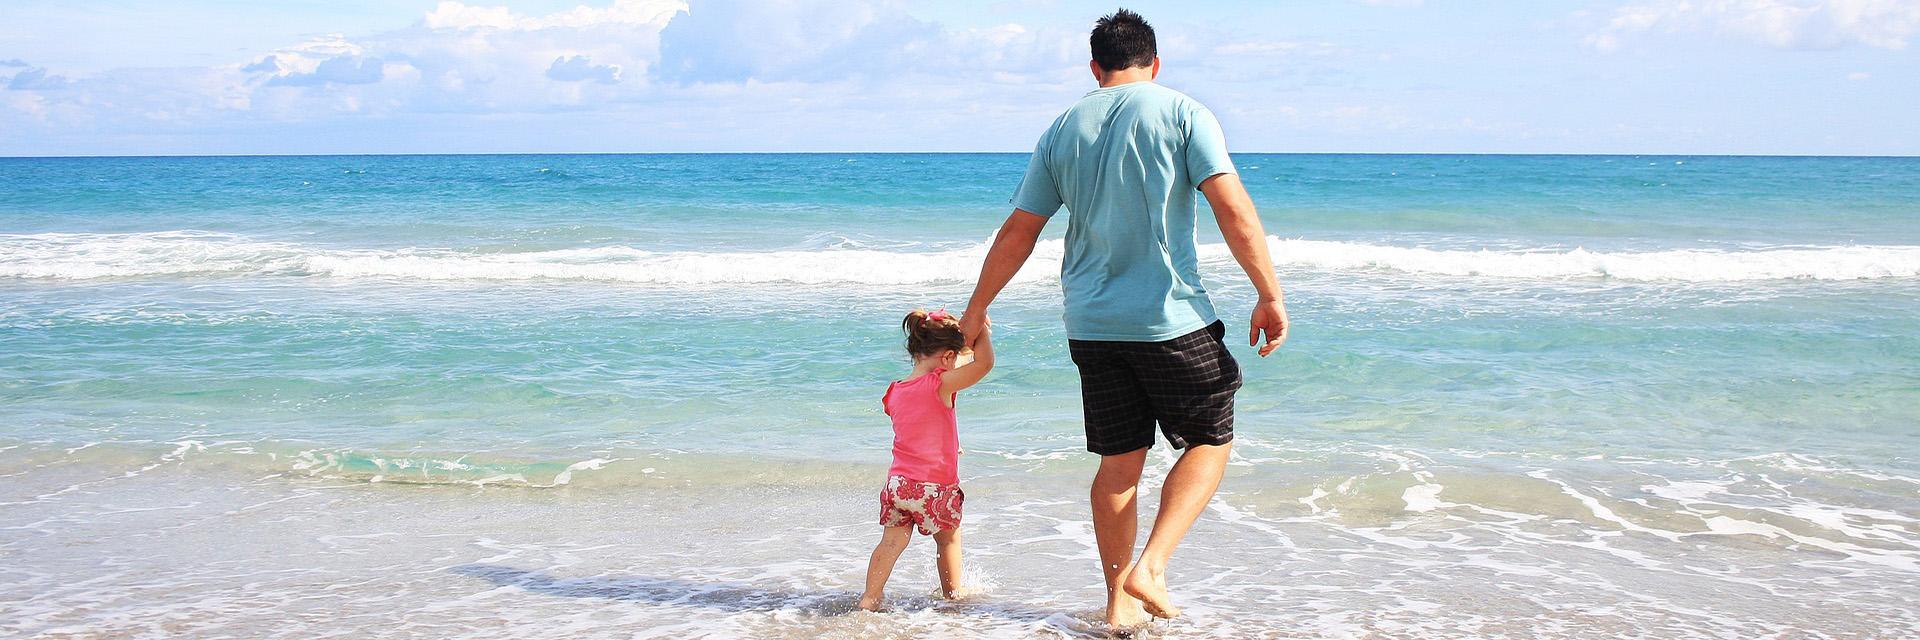 Village_club_vacances_vendee-village-océane-famille-mer-plage